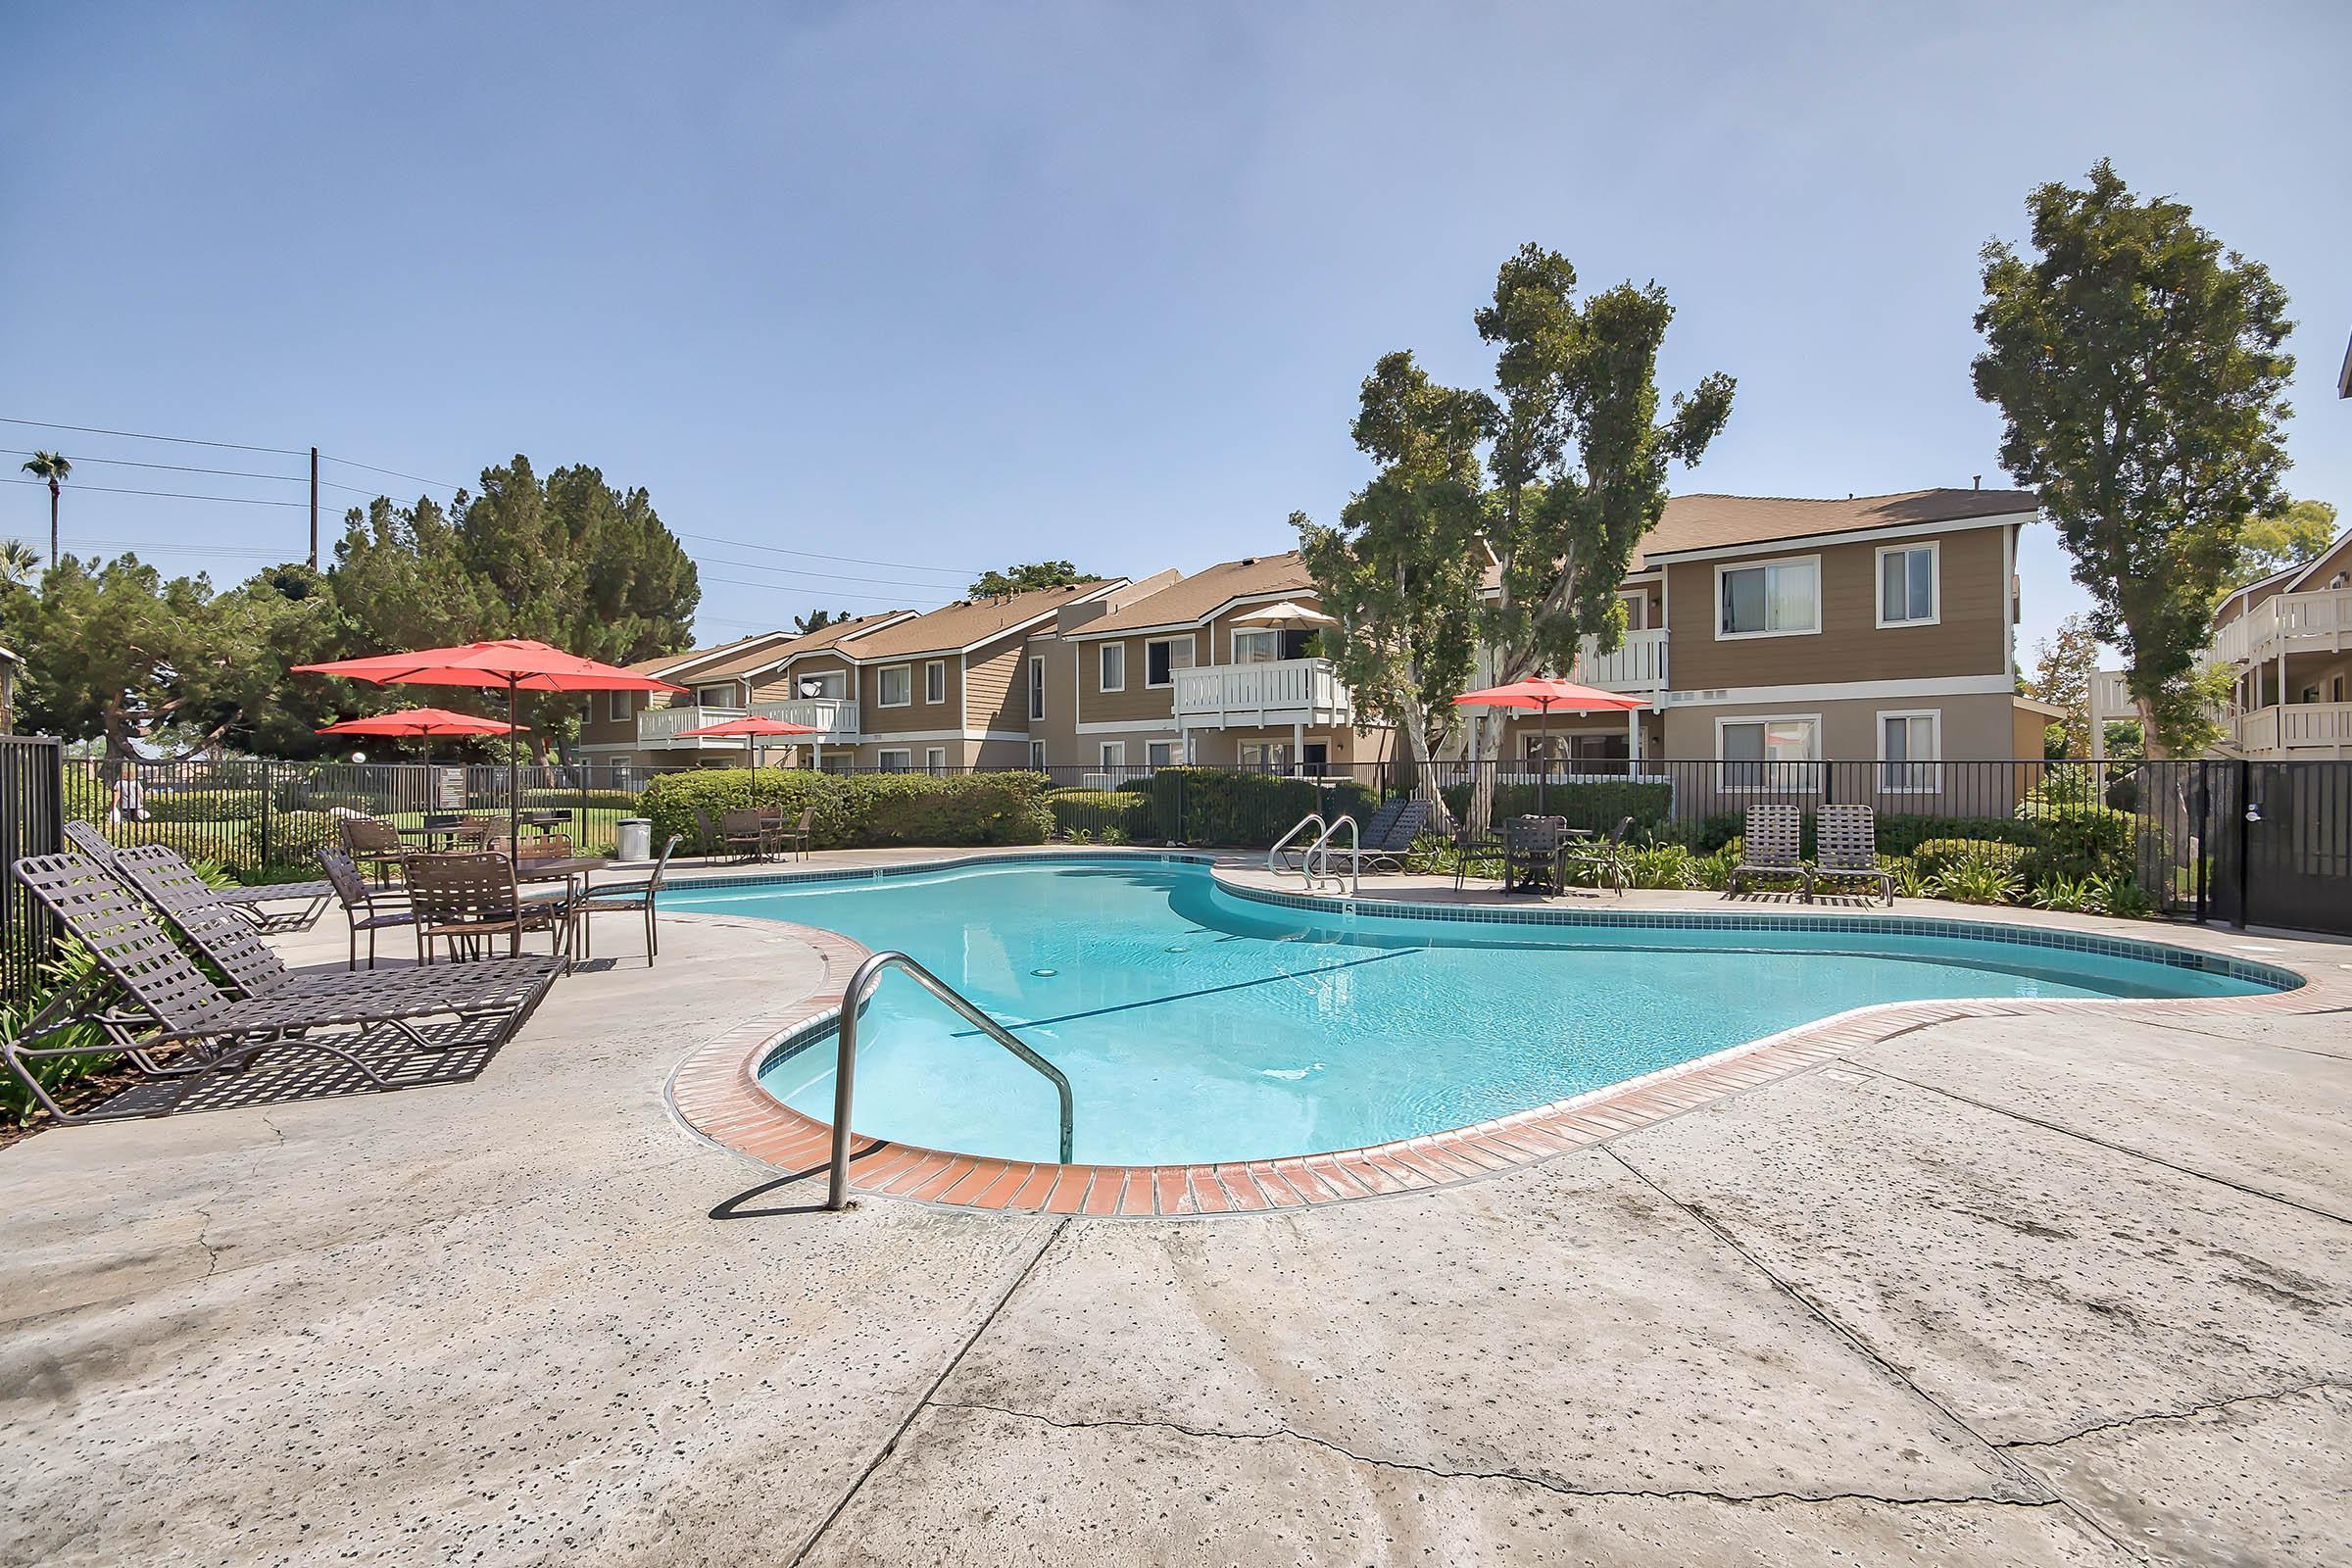 Pool_3900_W_5th_St_Santa_Ana_CA_Vintage-Woods_RPI_II-280948-6_v1_current.jpg